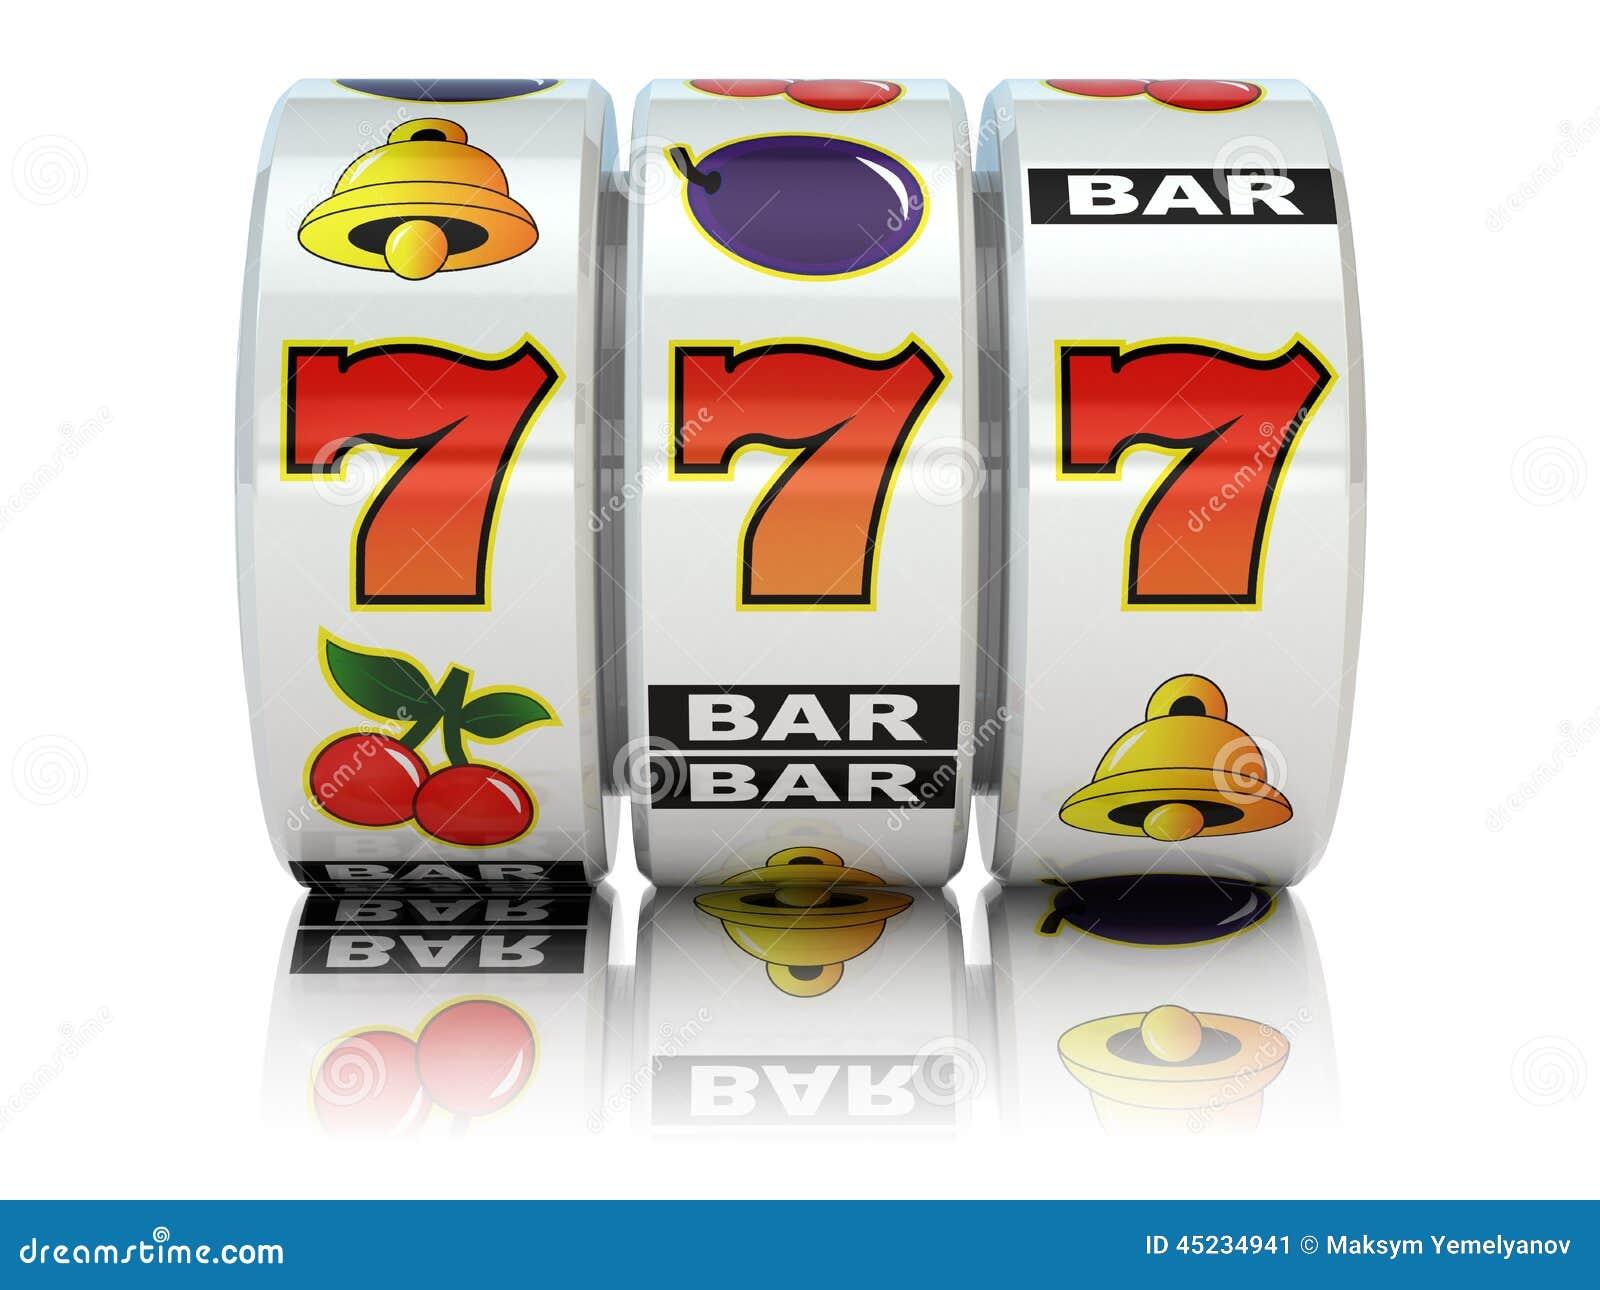 slots jackpot casino no deposit code